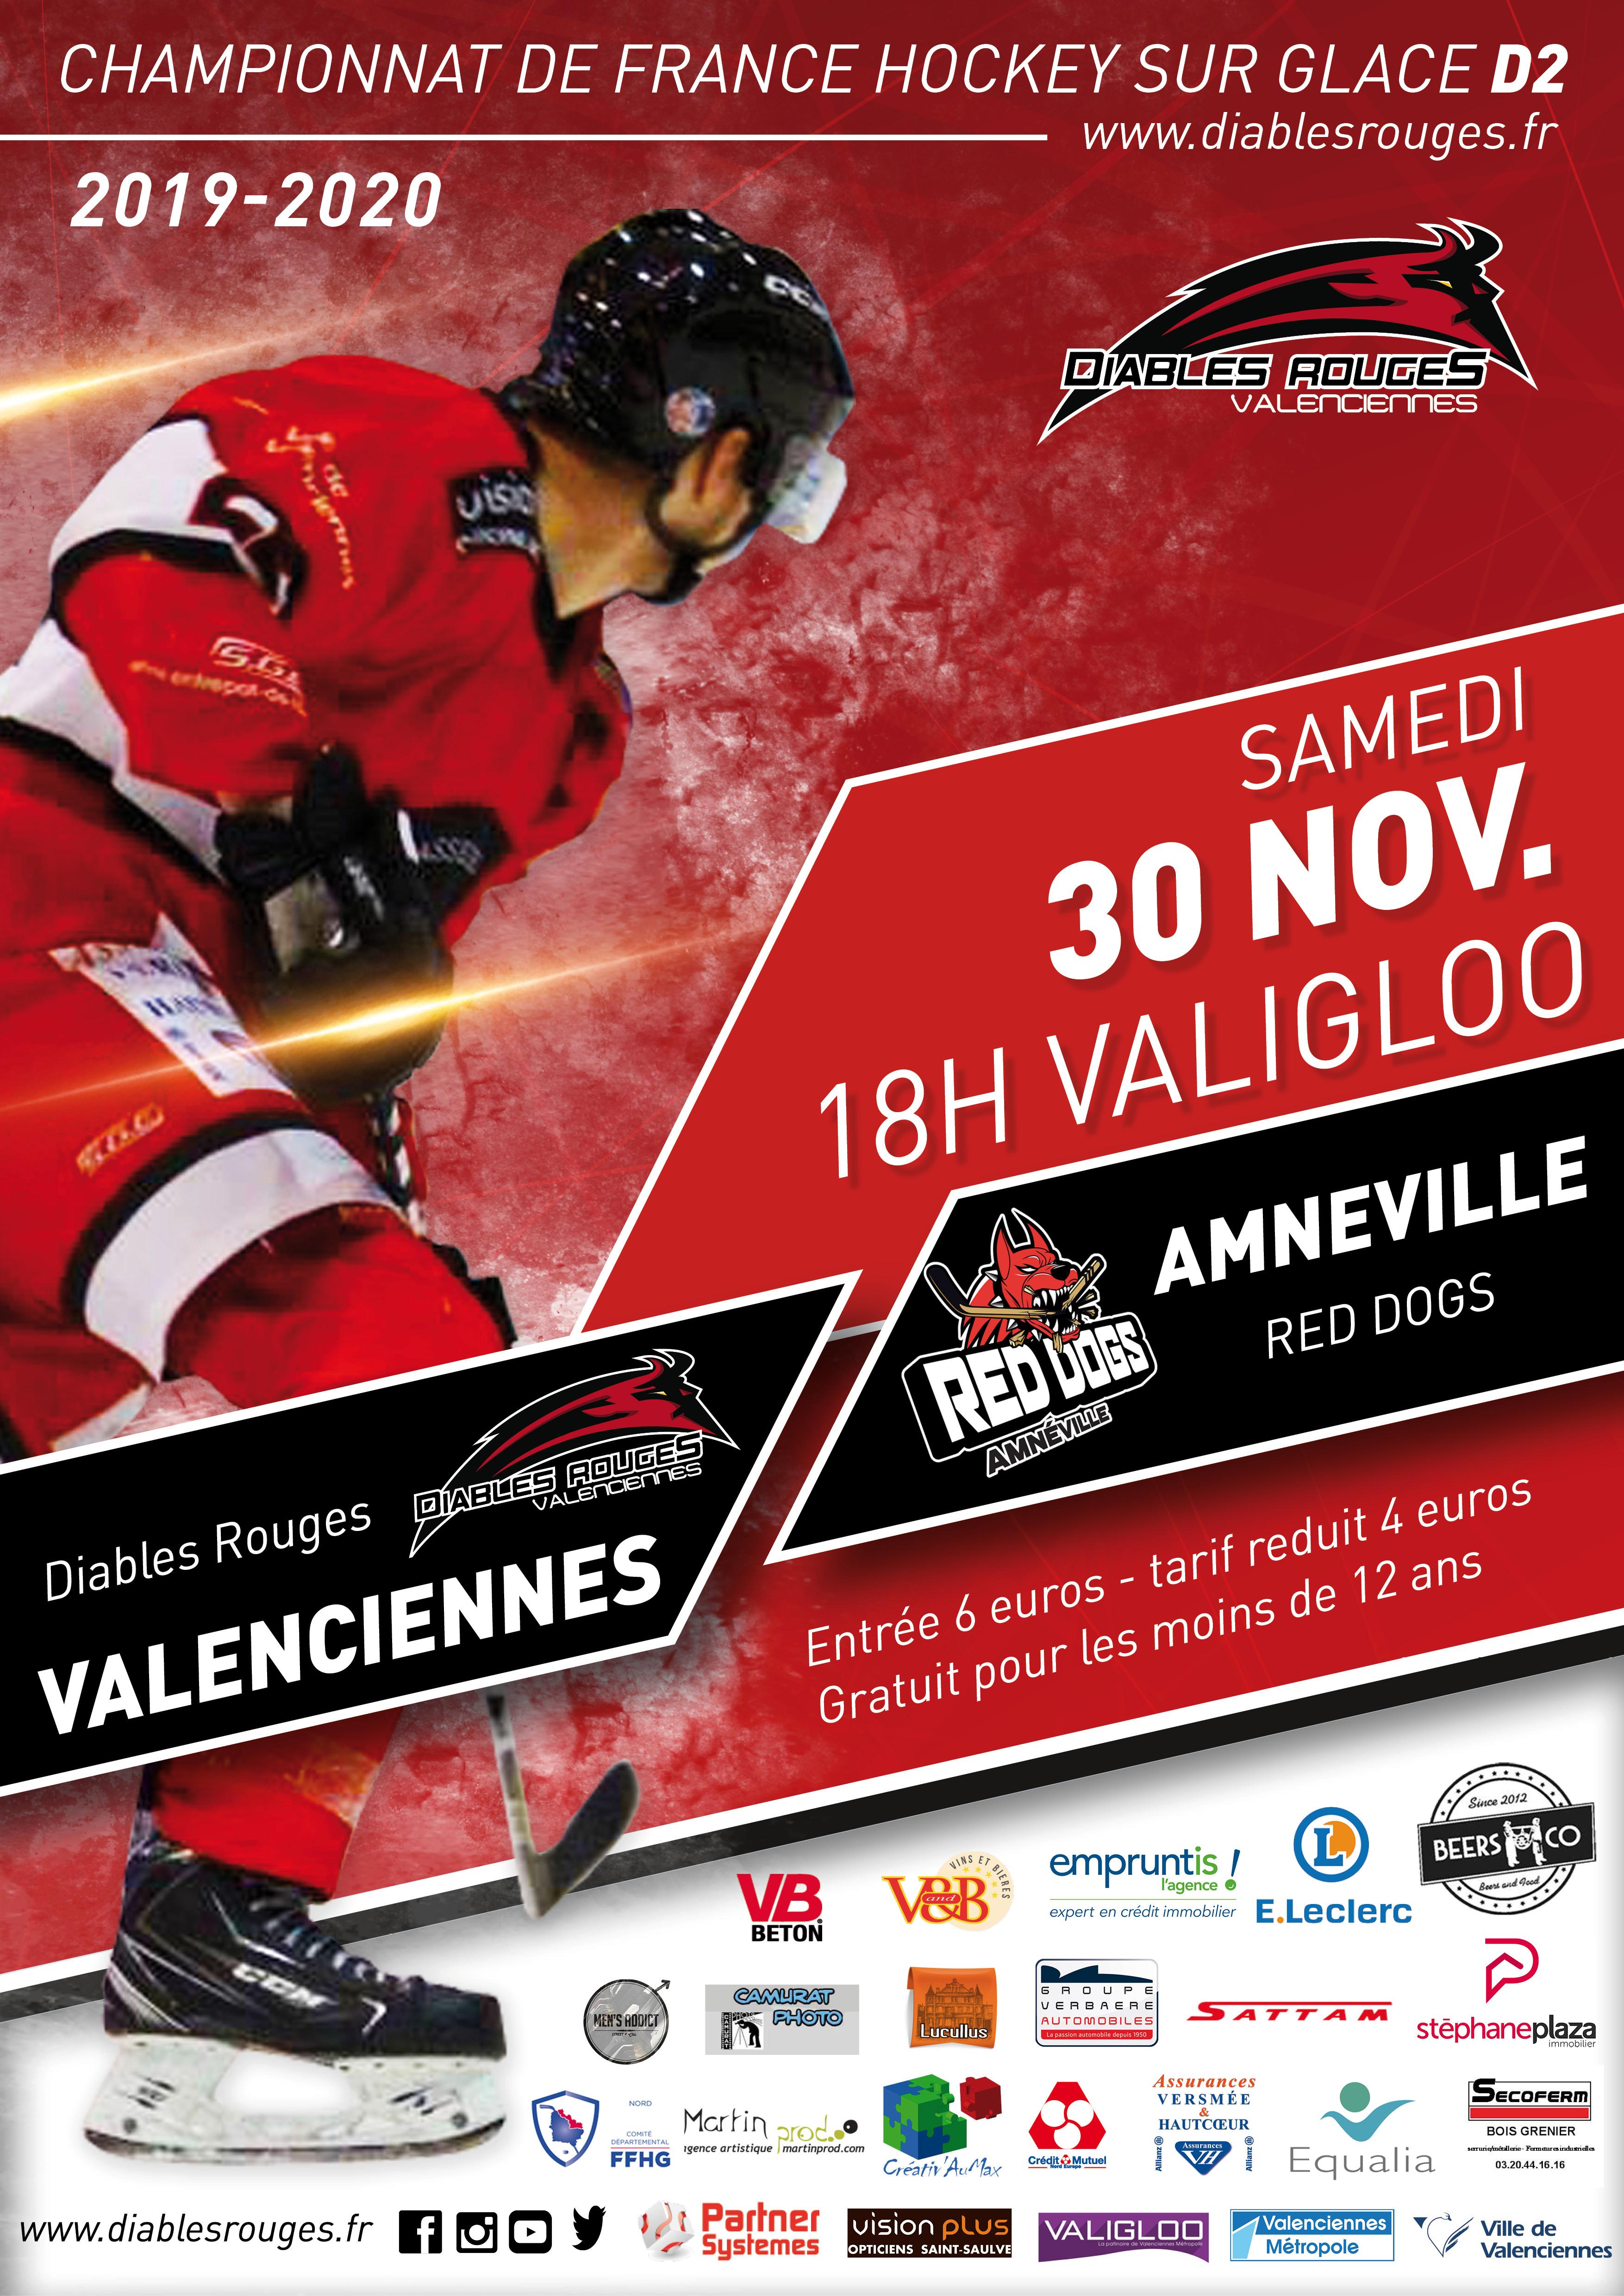 Valenciennes reçoit Amneville ce samedi 30 novembre 2019